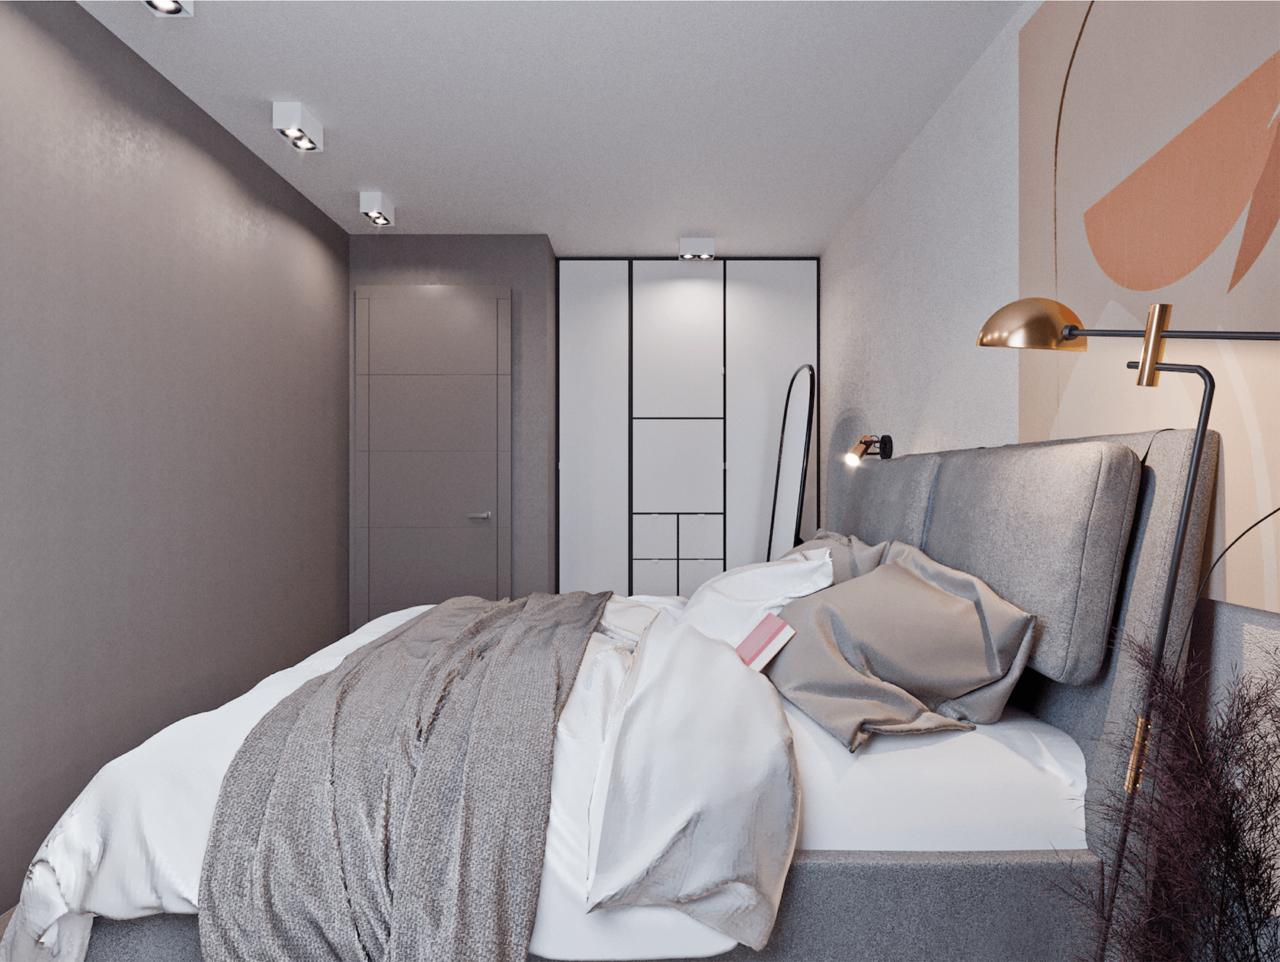 Дизайн проект двухкомнатной квартиры, бирюзовій акцент, Киев | фото 21